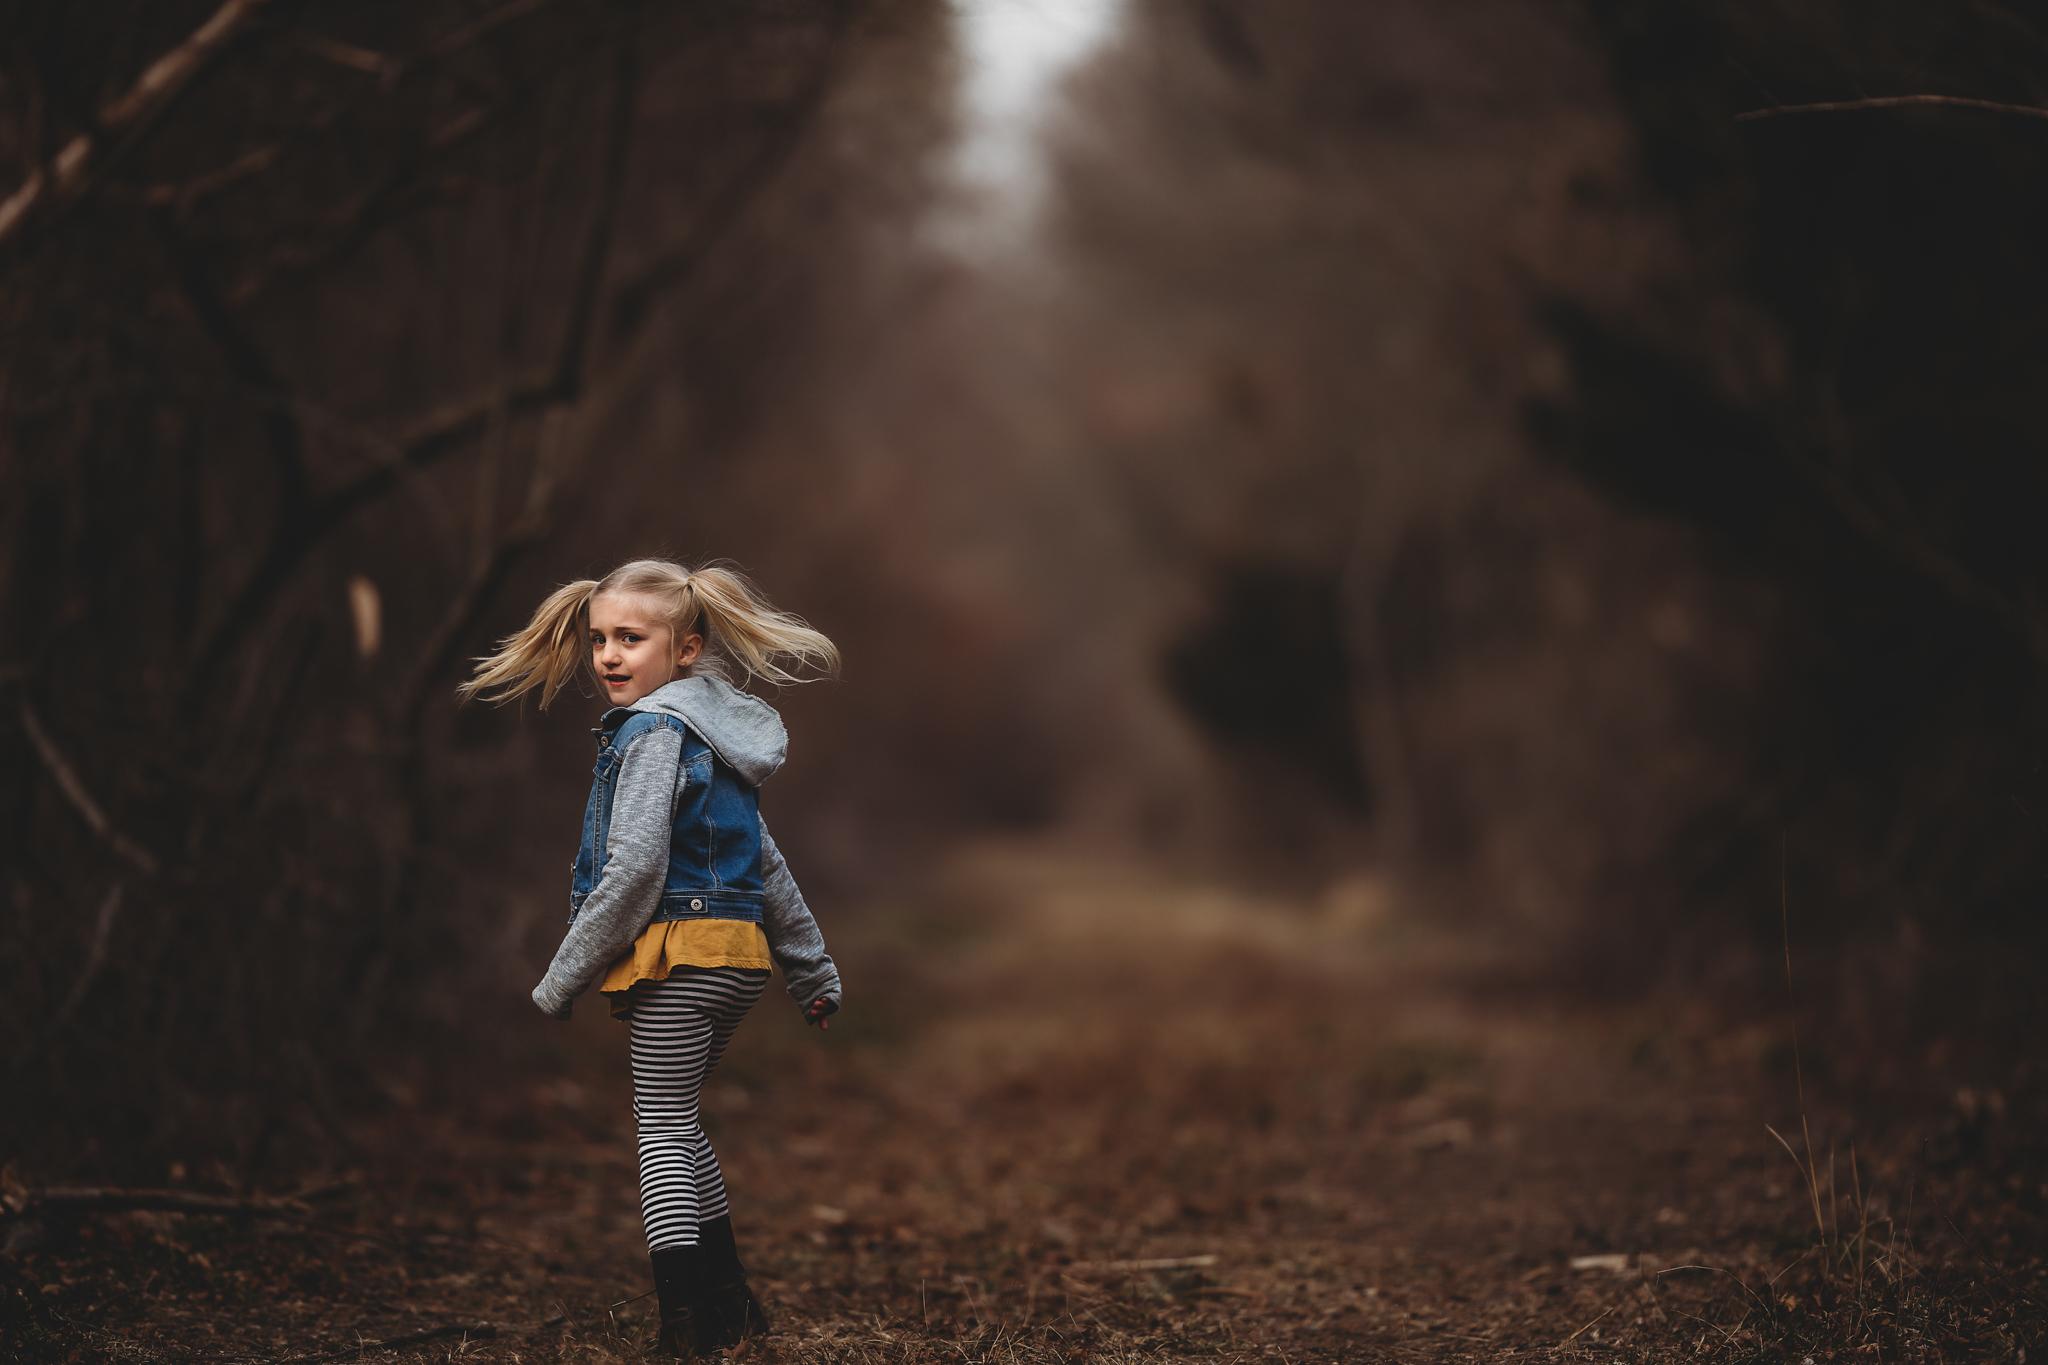 Long-island-photographer-hello-olivia-photography-children-kids-photos-new-york-lifestyle-portraits-suffolk-County-LI-48.jpg